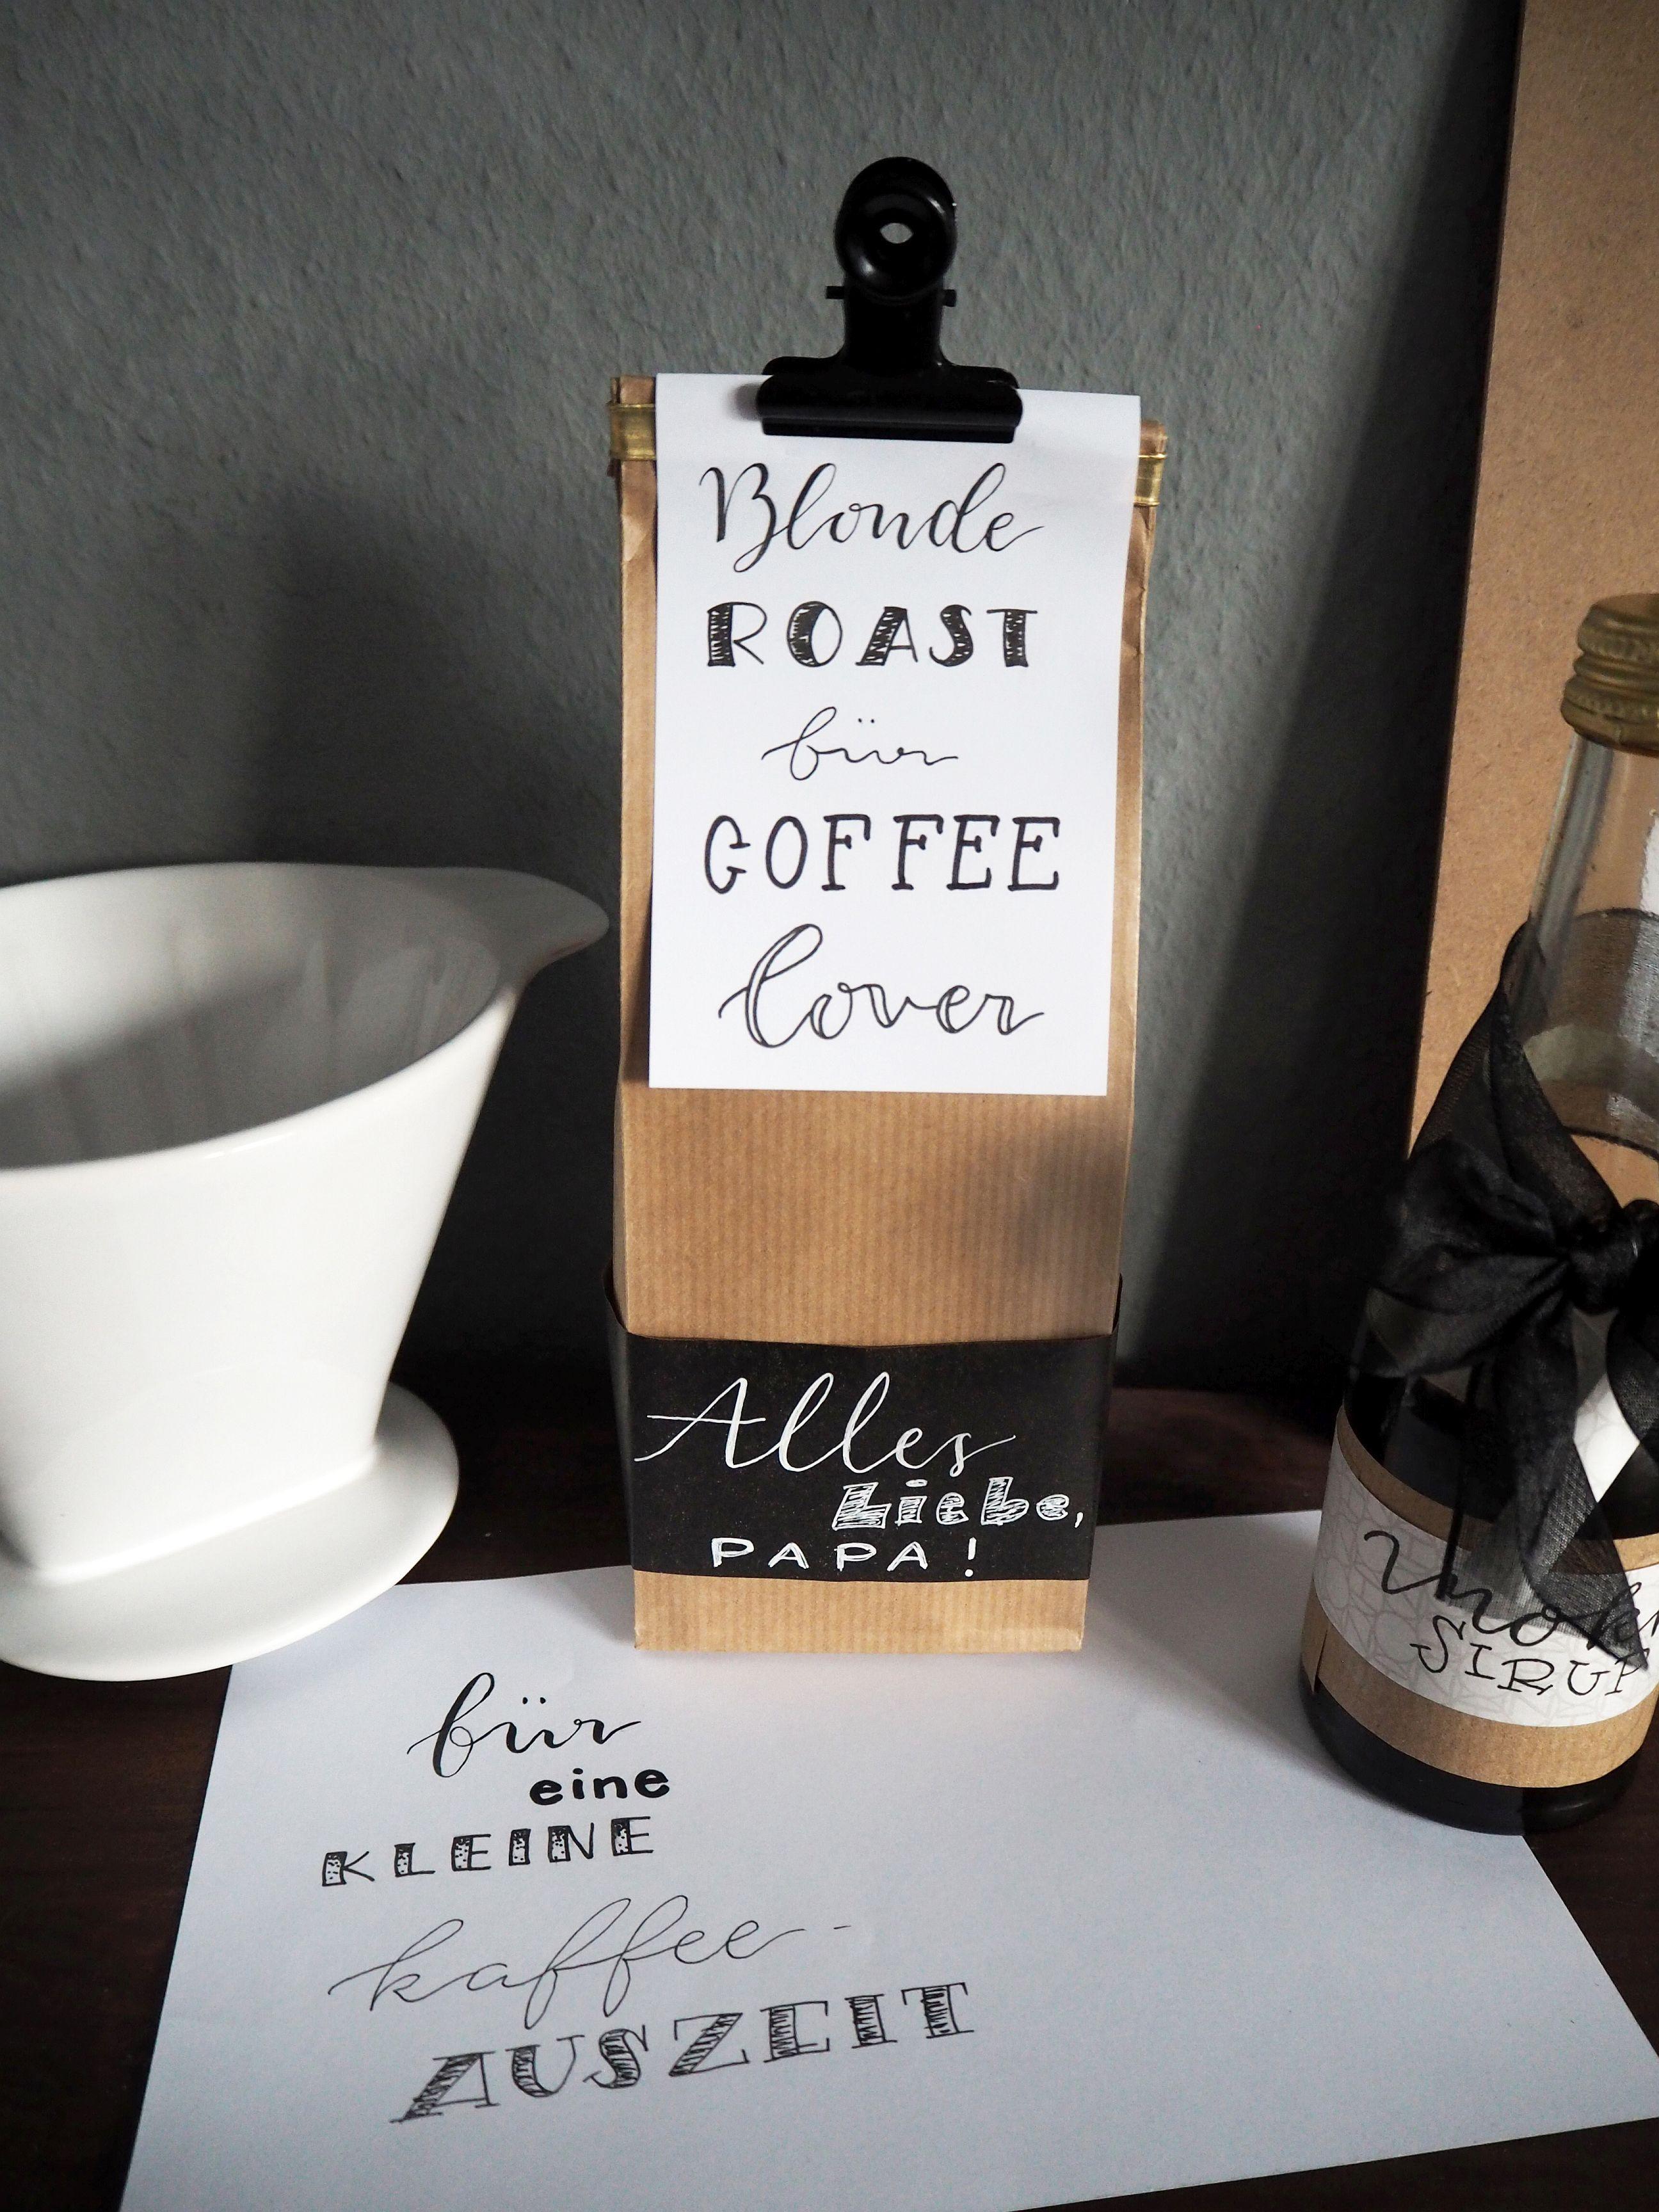 2018-05-skoen-och-kreativ-diy-lettering-set-fuer-kaffee-auszeit-zum-vatertag (10)